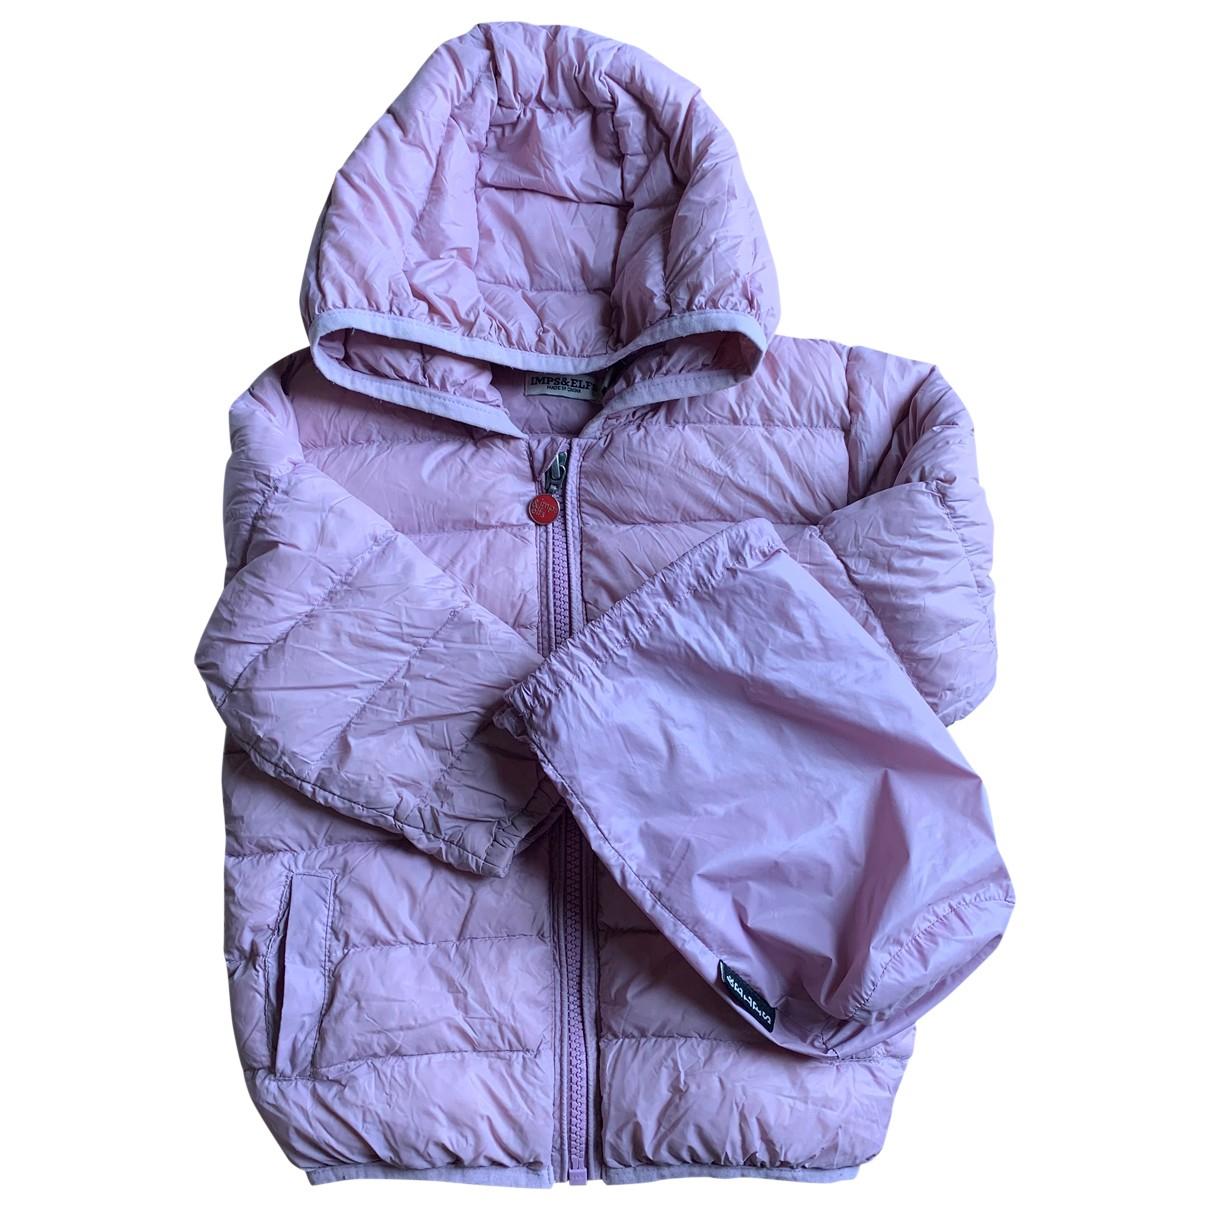 Imps & Elfs N Pink jacket & coat for Kids 2 years - up to 86cm FR